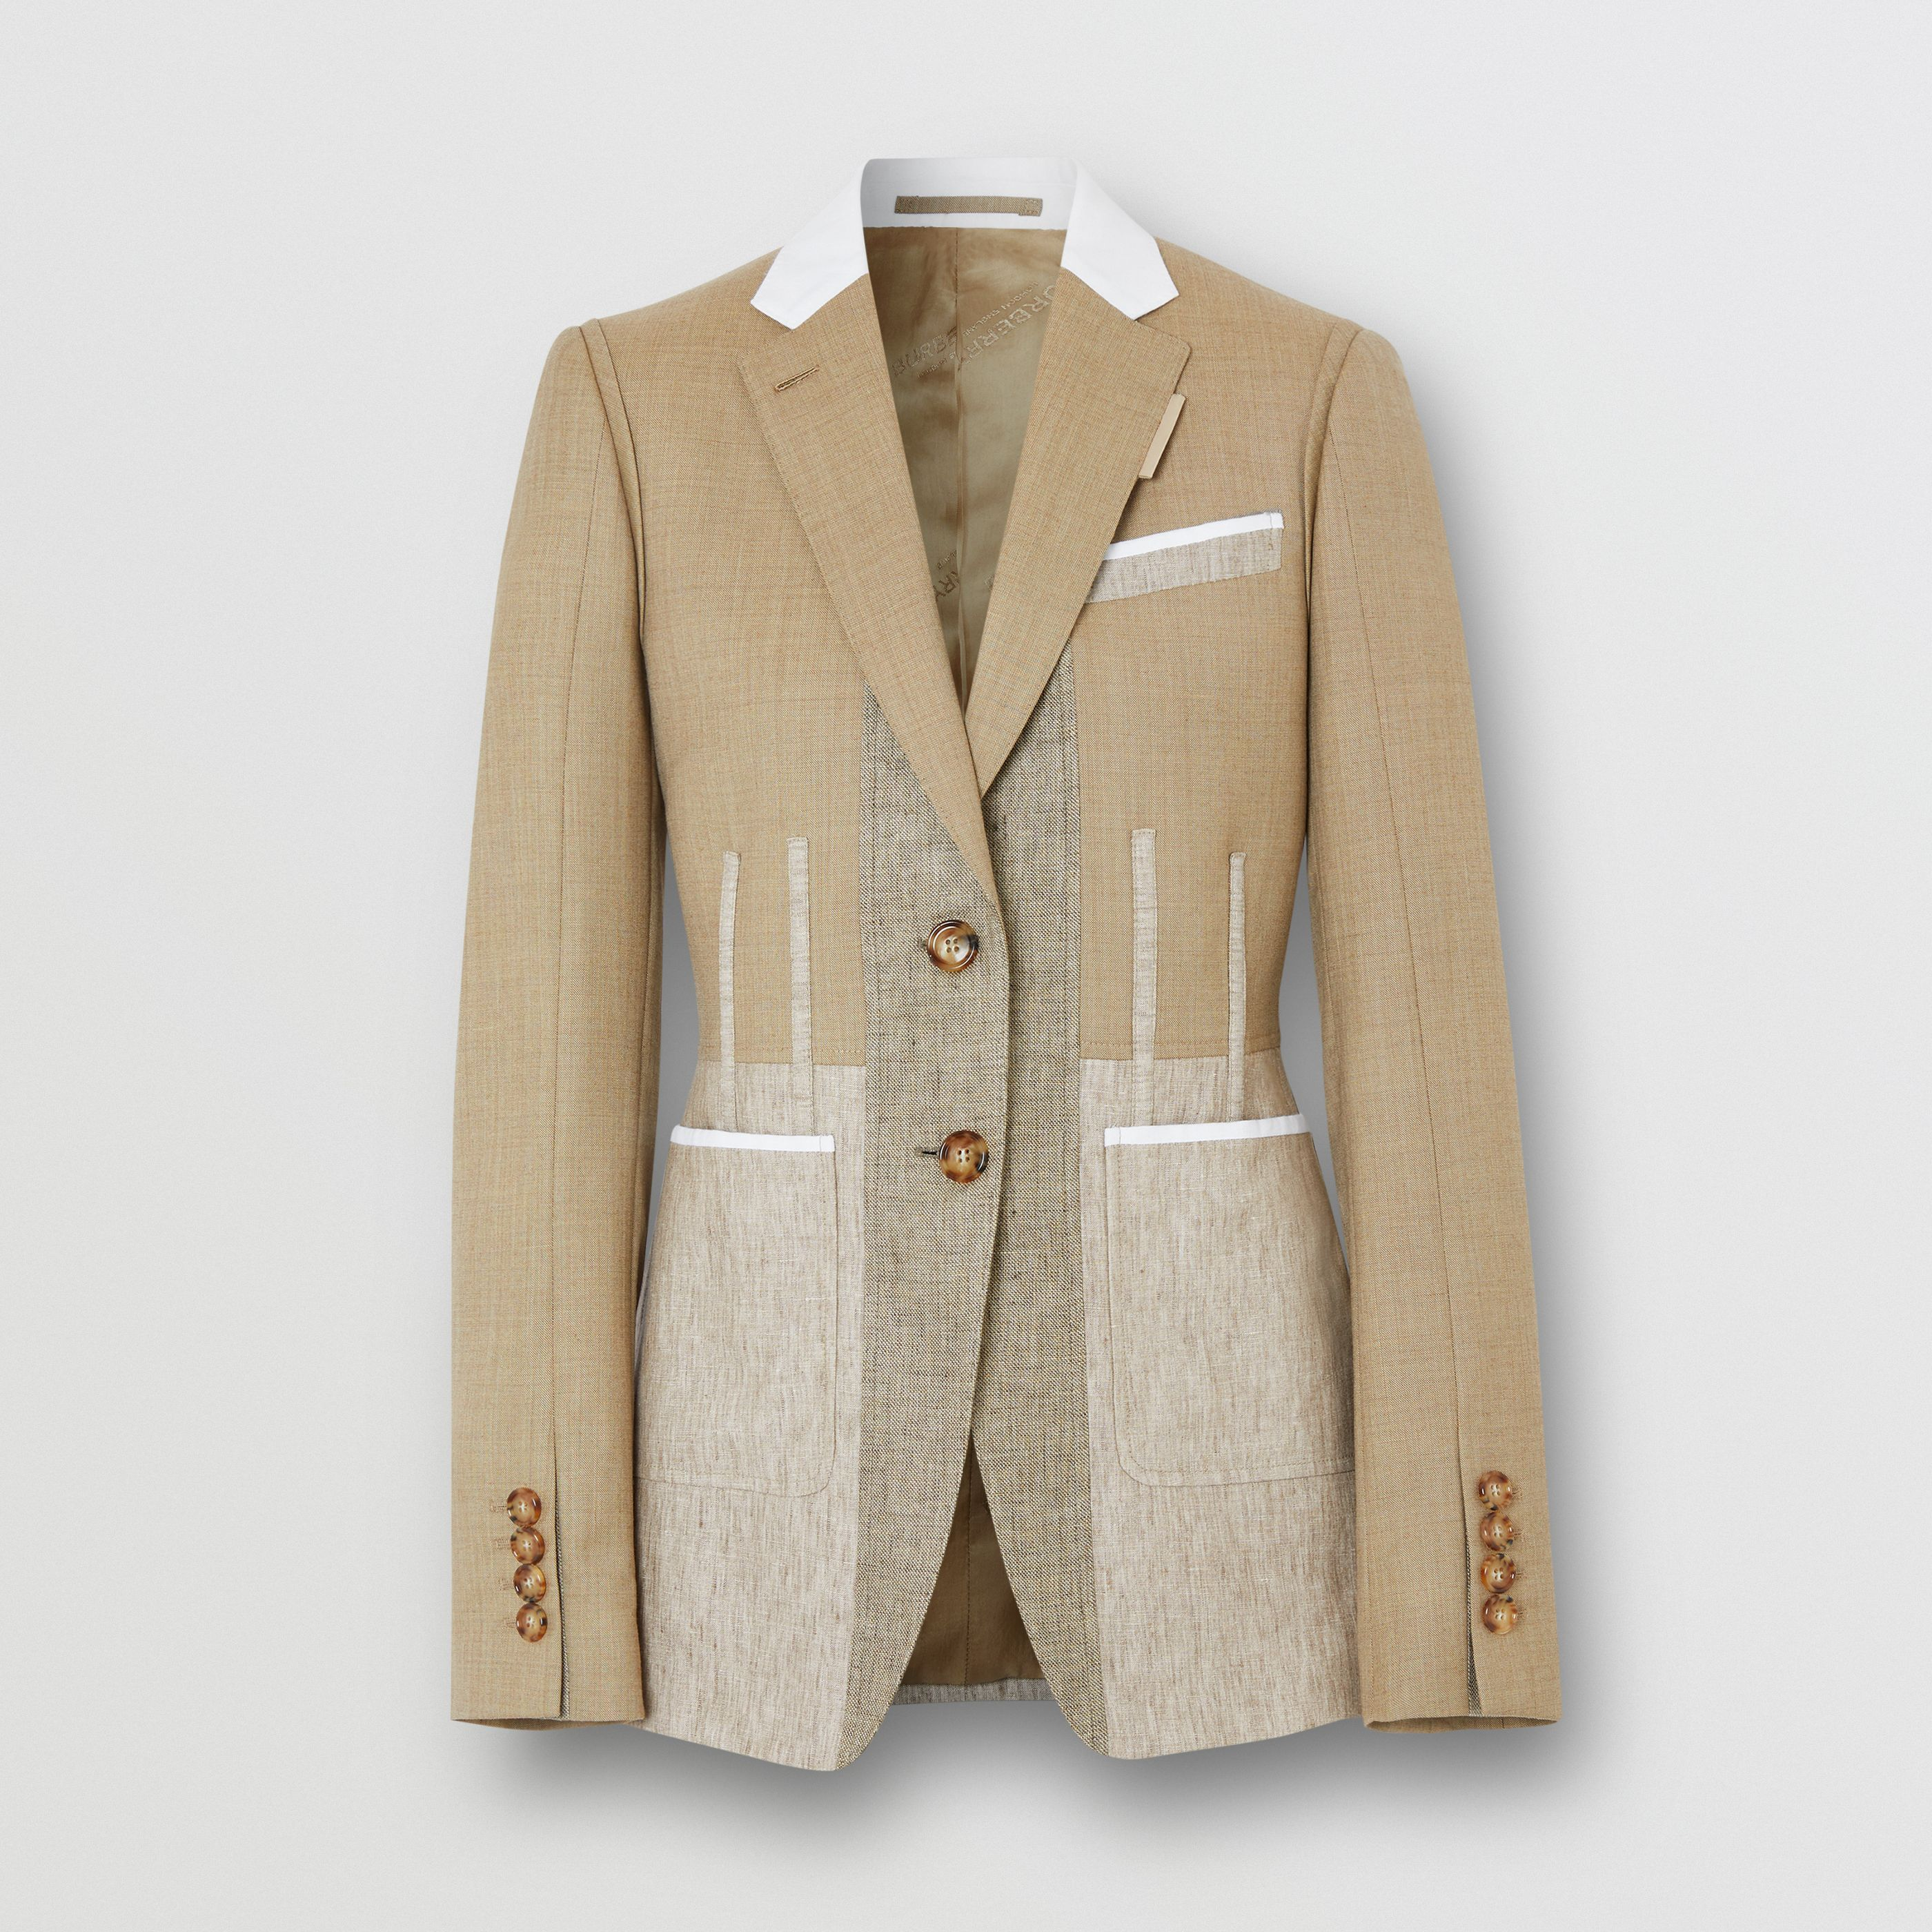 Blazer in lana, cashmere e lino con cuciture a contrasto (Noce Pecan Mélange) - Donna | Burberry - 4